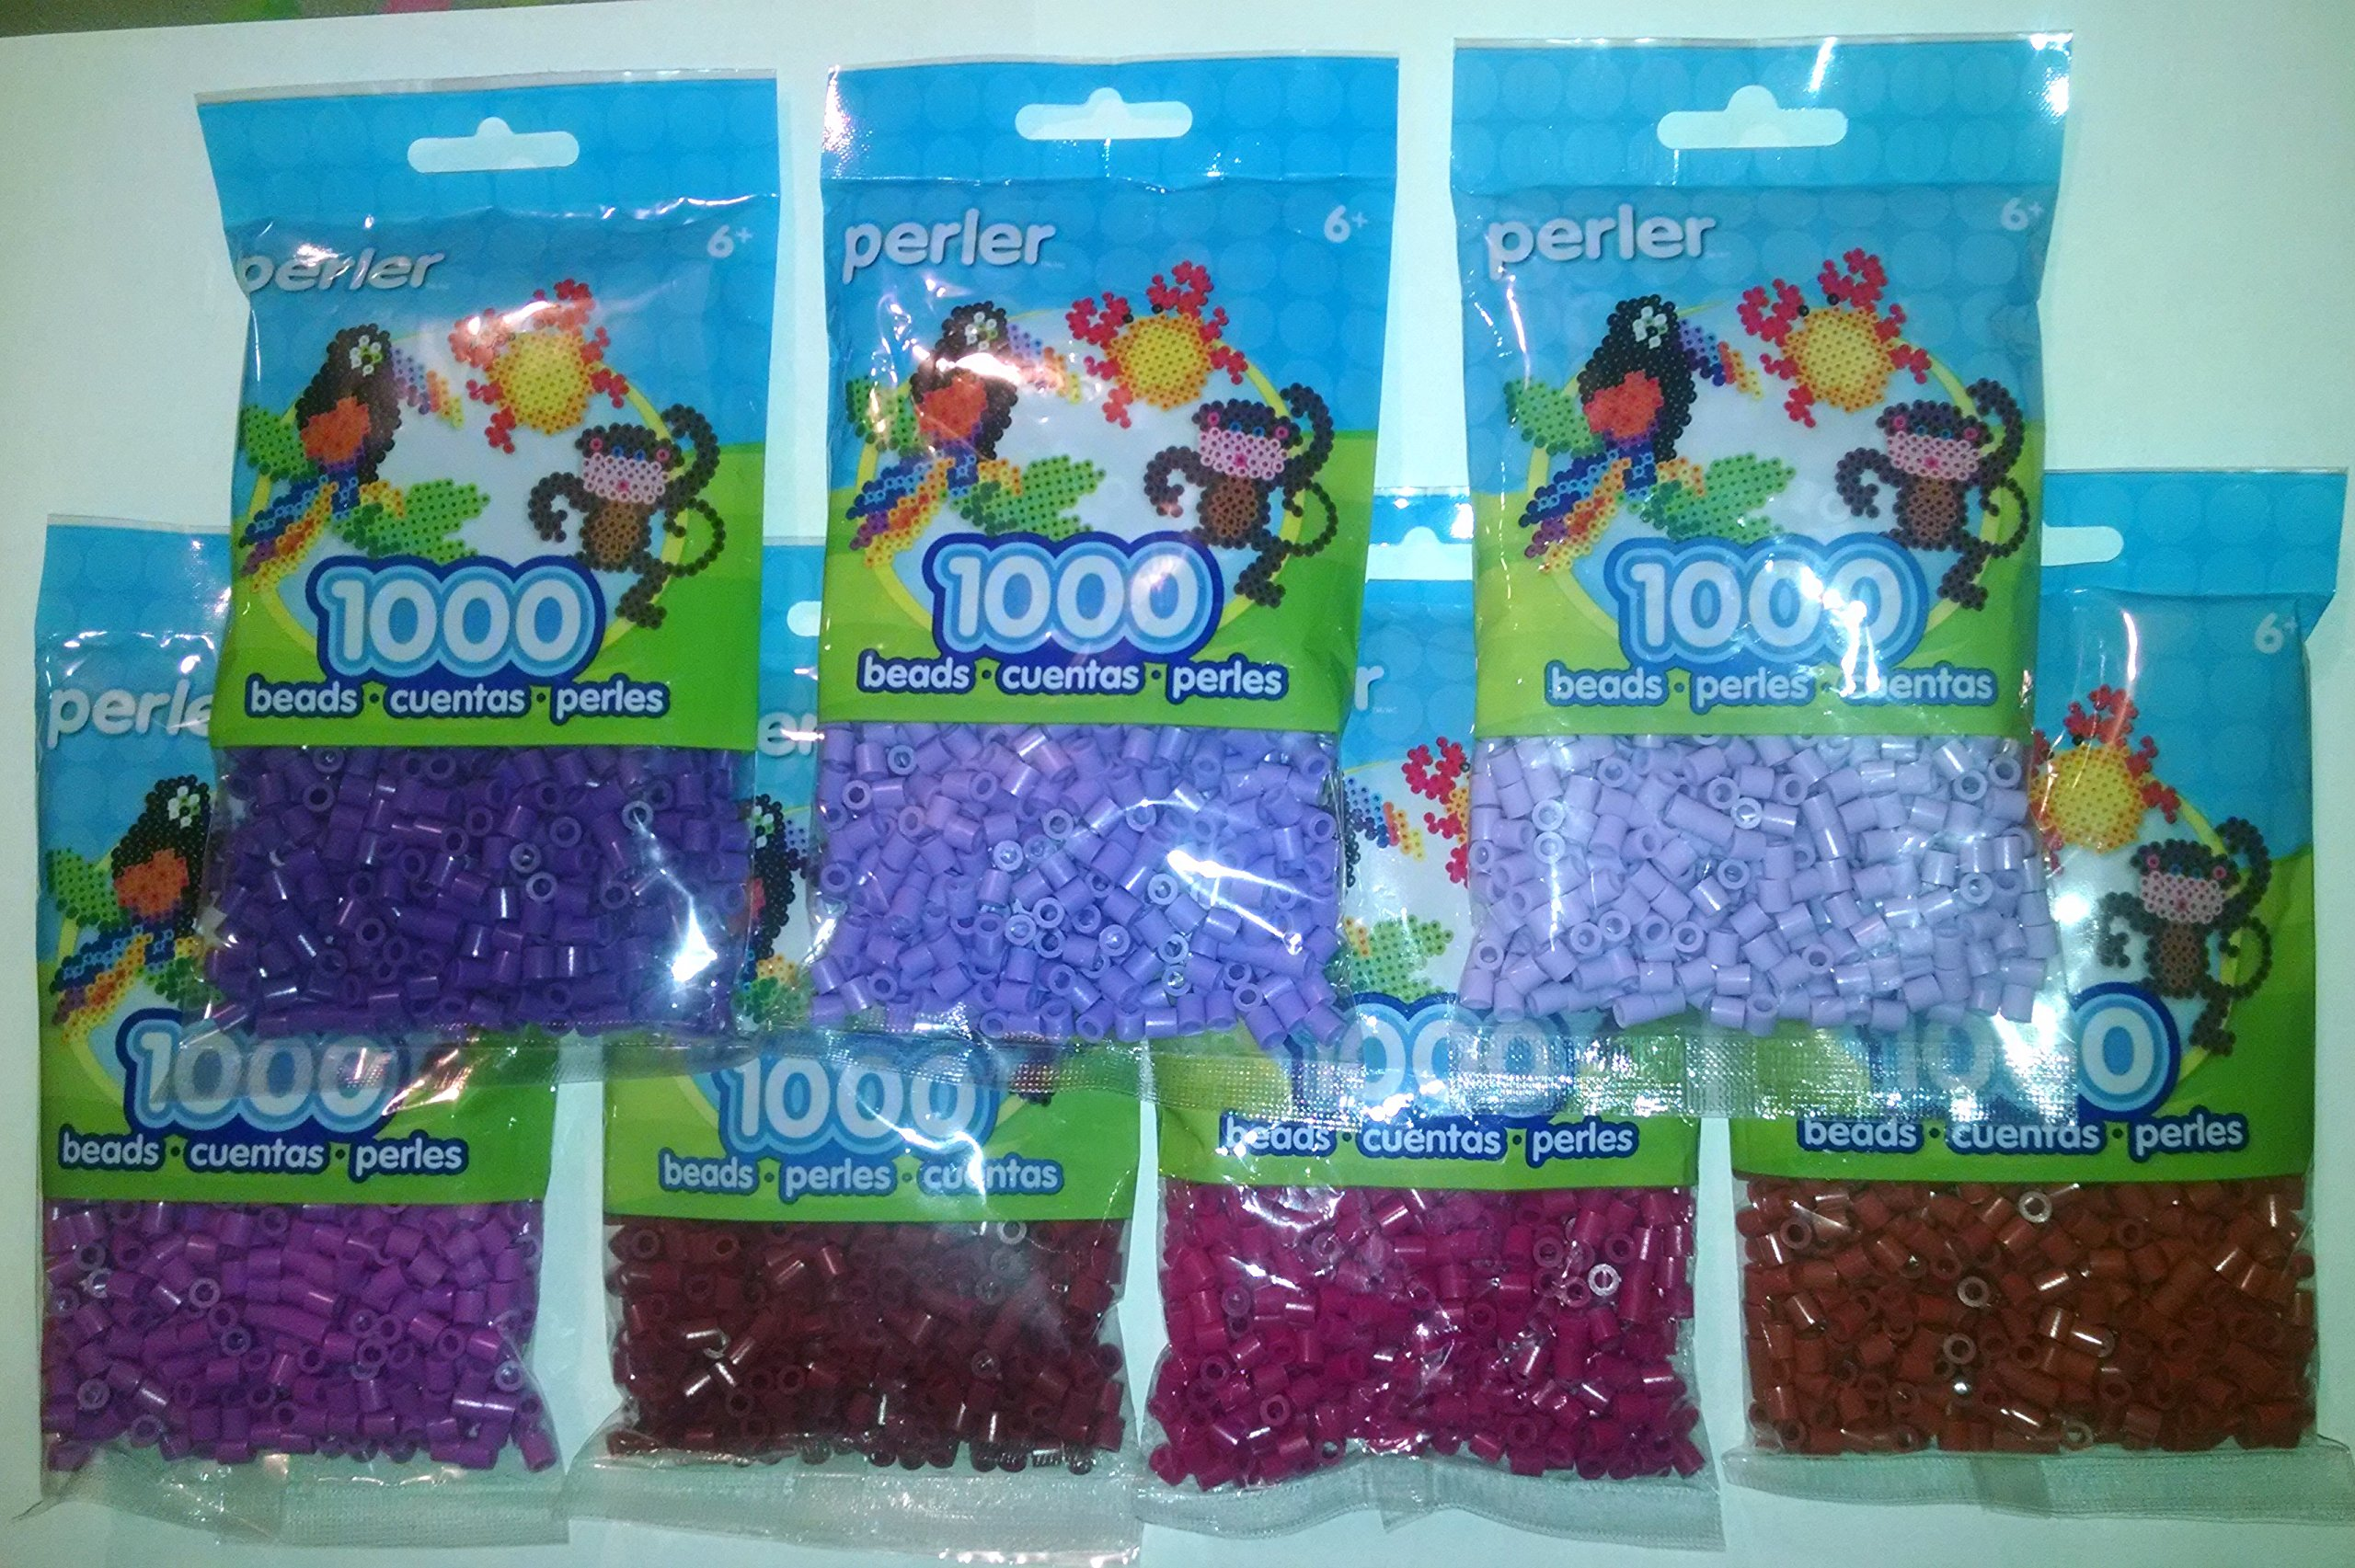 Perler Bead Bag, 7 Purple Rd/BR Group (Purple, Light Lavender, Pastel Lavender, Rust, Cranapple, Raspberry, Plum)